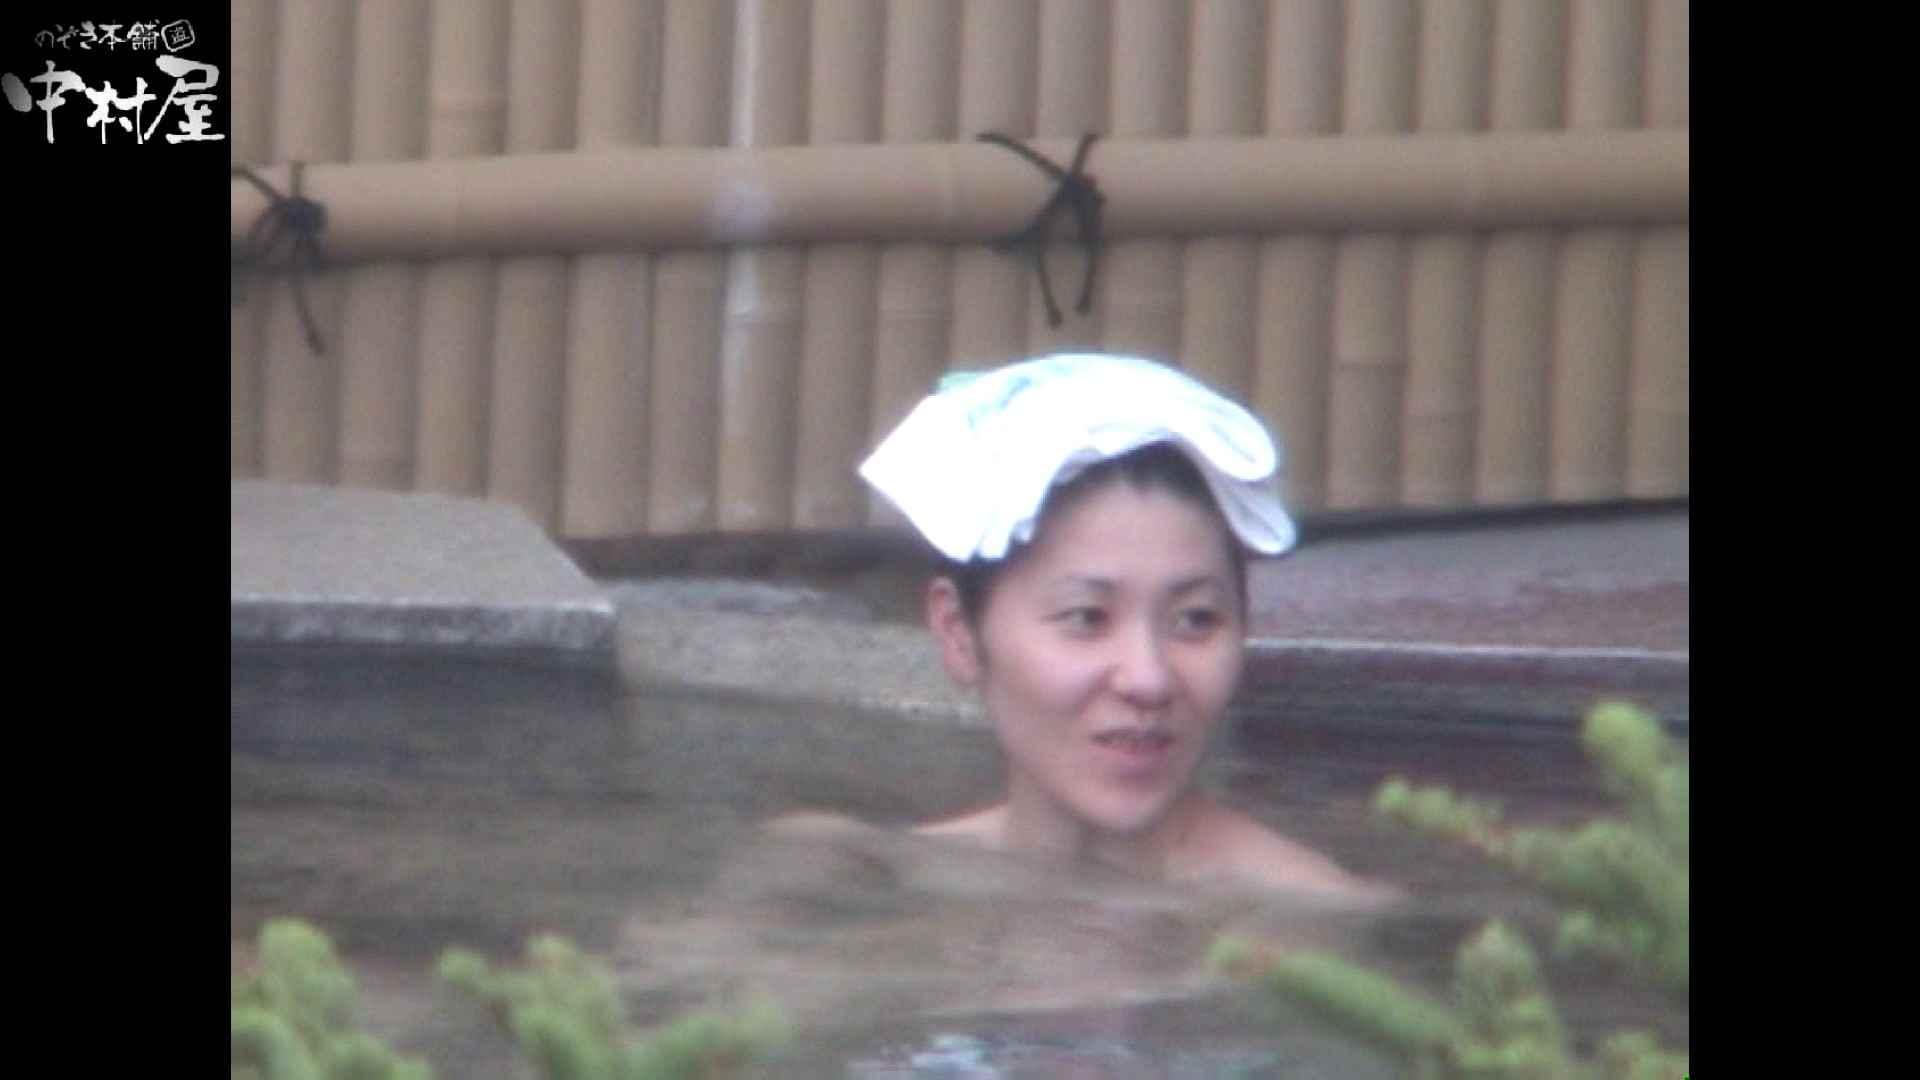 Aquaな露天風呂Vol.925 盗撮   HなOL  104pic 41